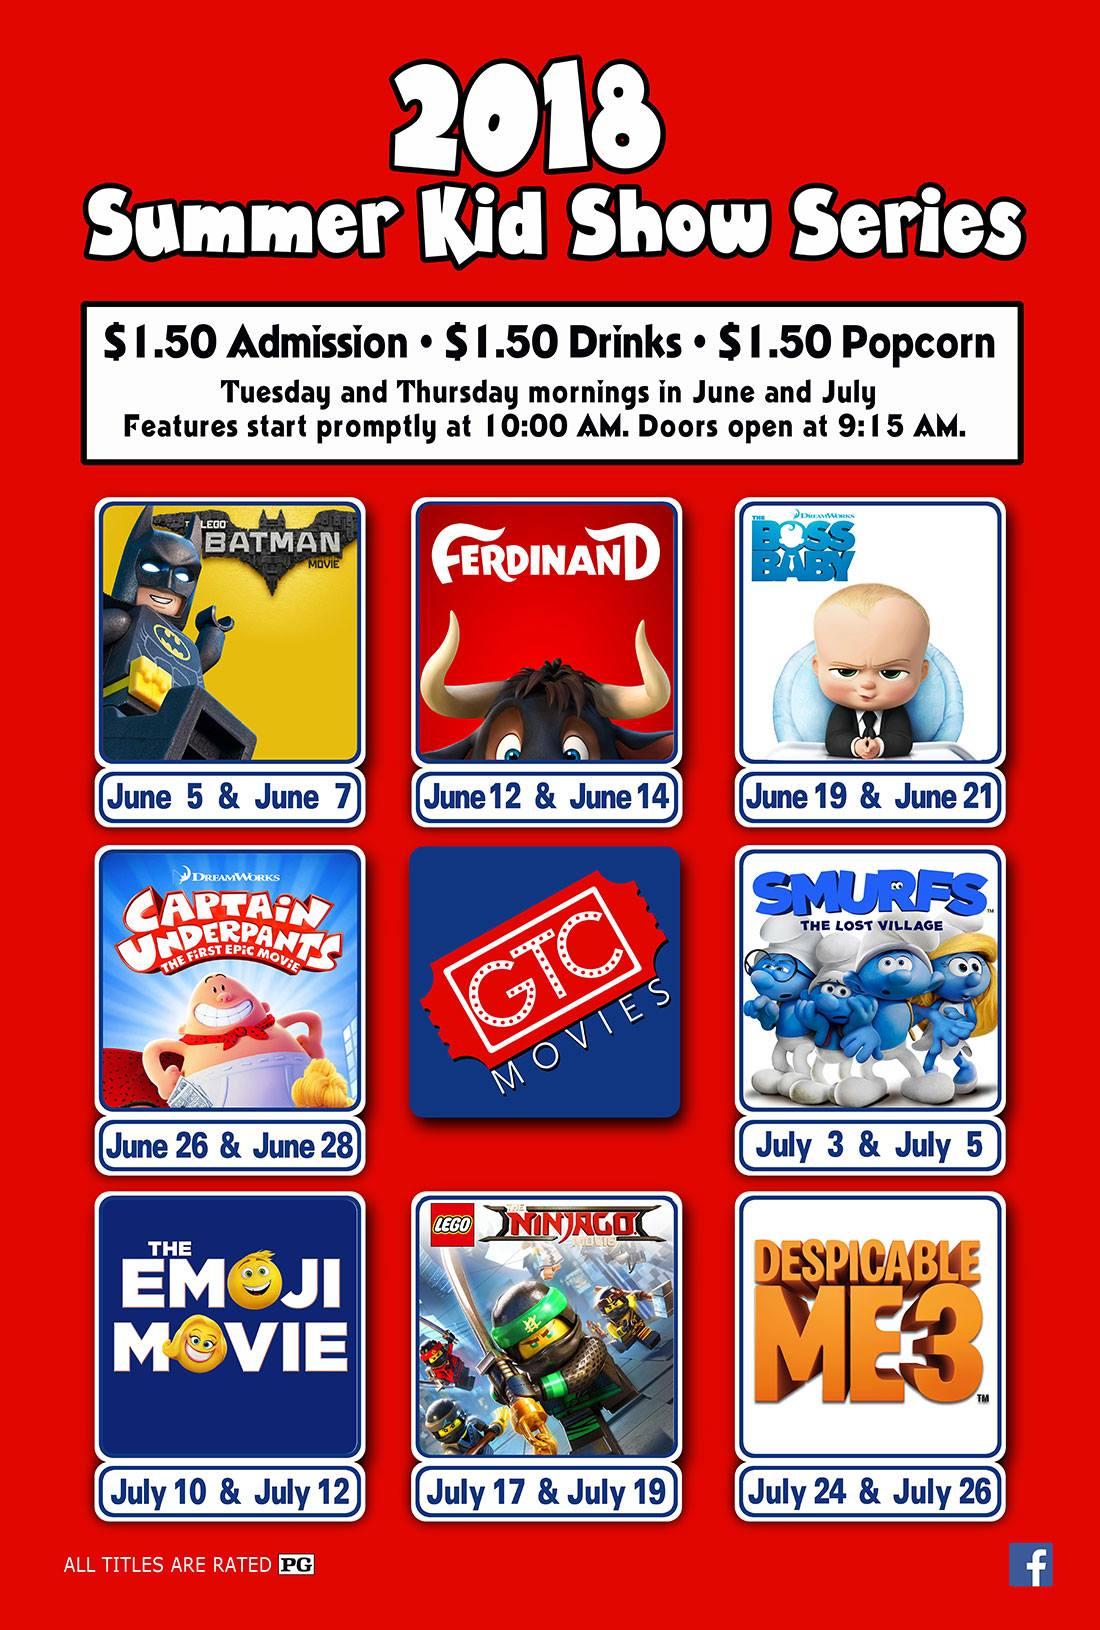 2018 Summer Kid Show Series at GTC Movies